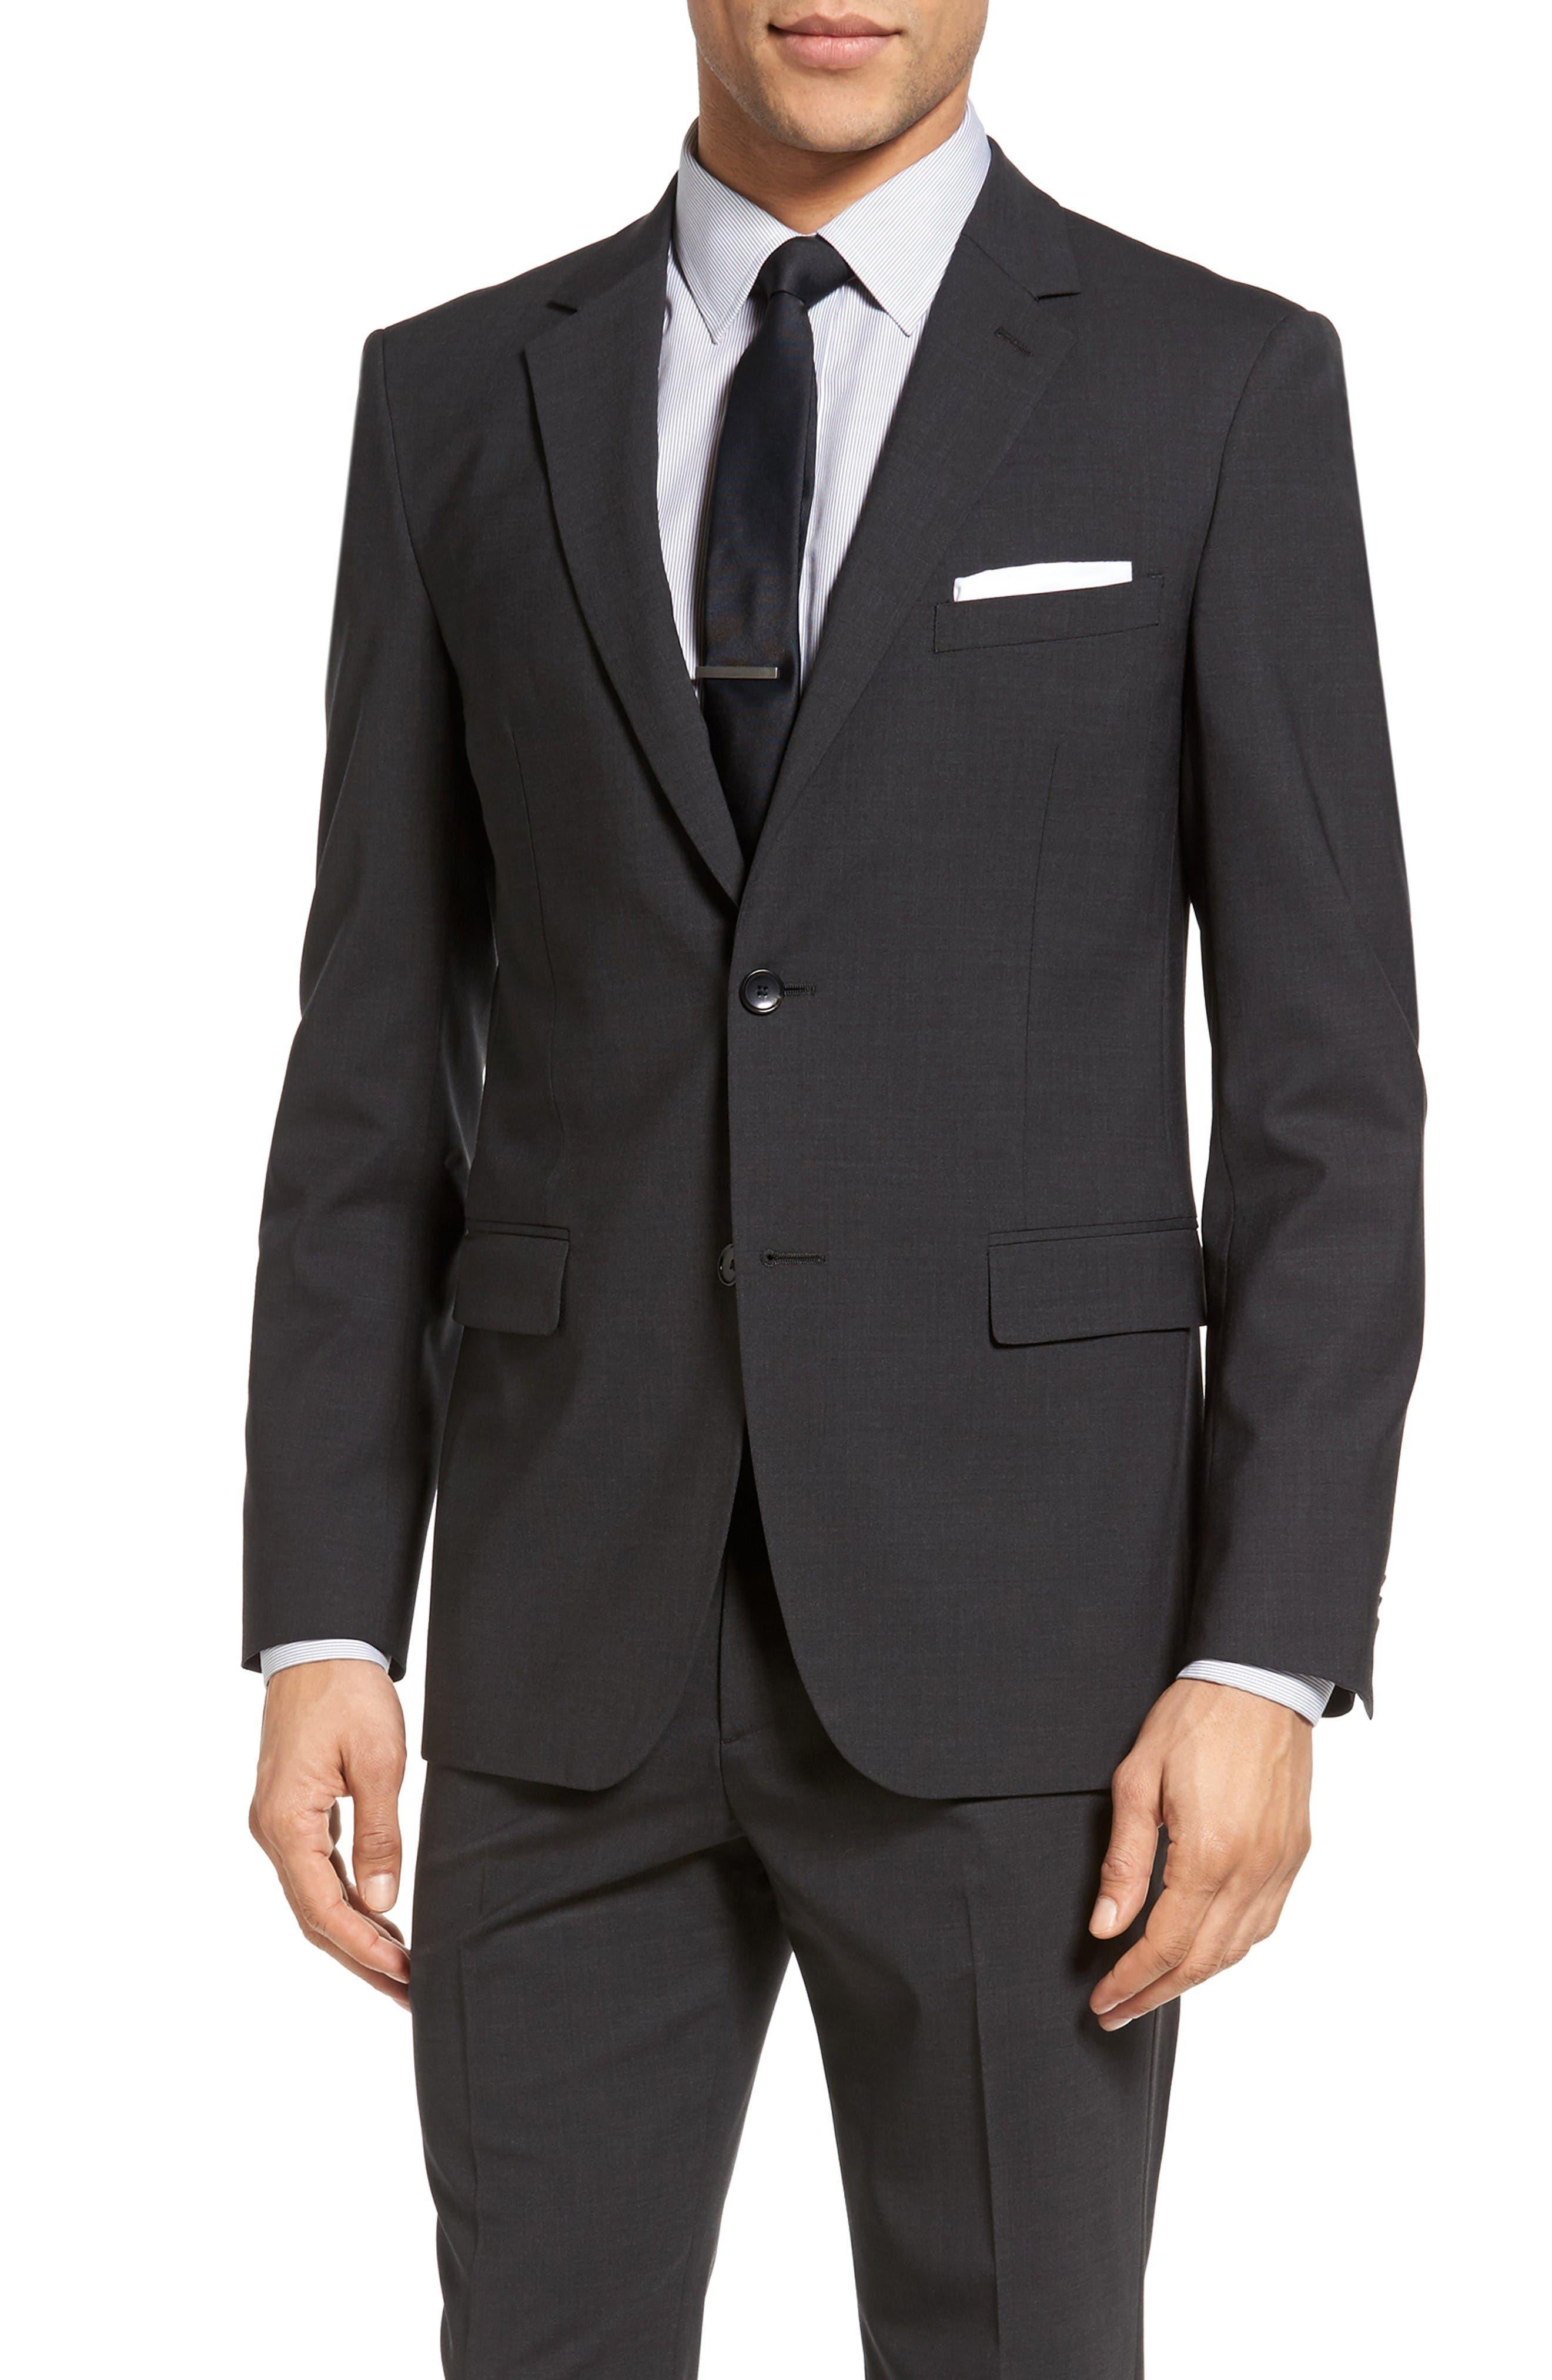 Wellar New Tailor 1 Trim Fit Stretch Wool Sport Coat,                         Main,                         color, Dark Charcoal